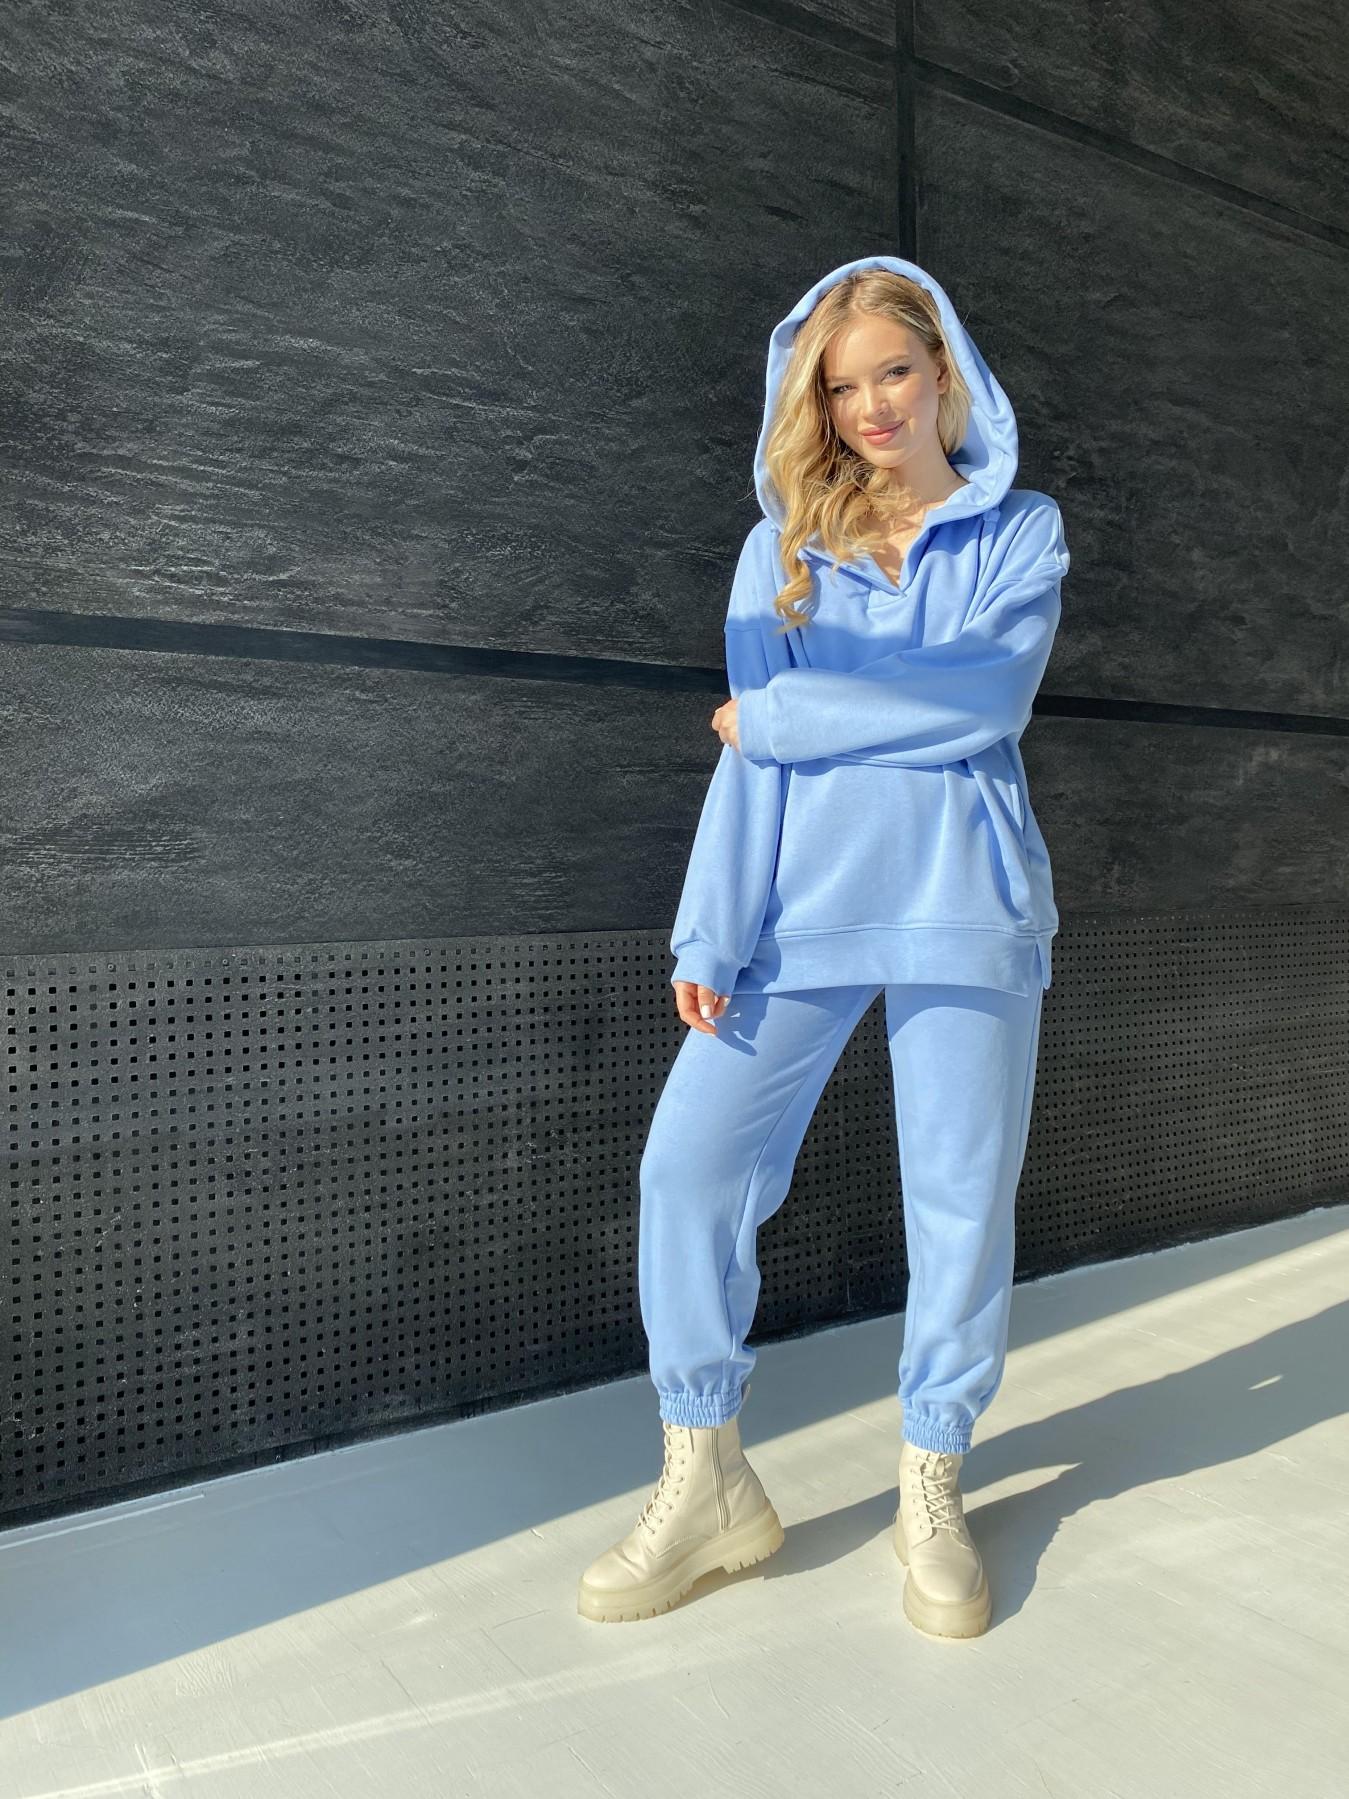 Ярис костюм из 3х нитки 10789 АРТ. 47260 Цвет: Голубой - фото 5, интернет магазин tm-modus.ru